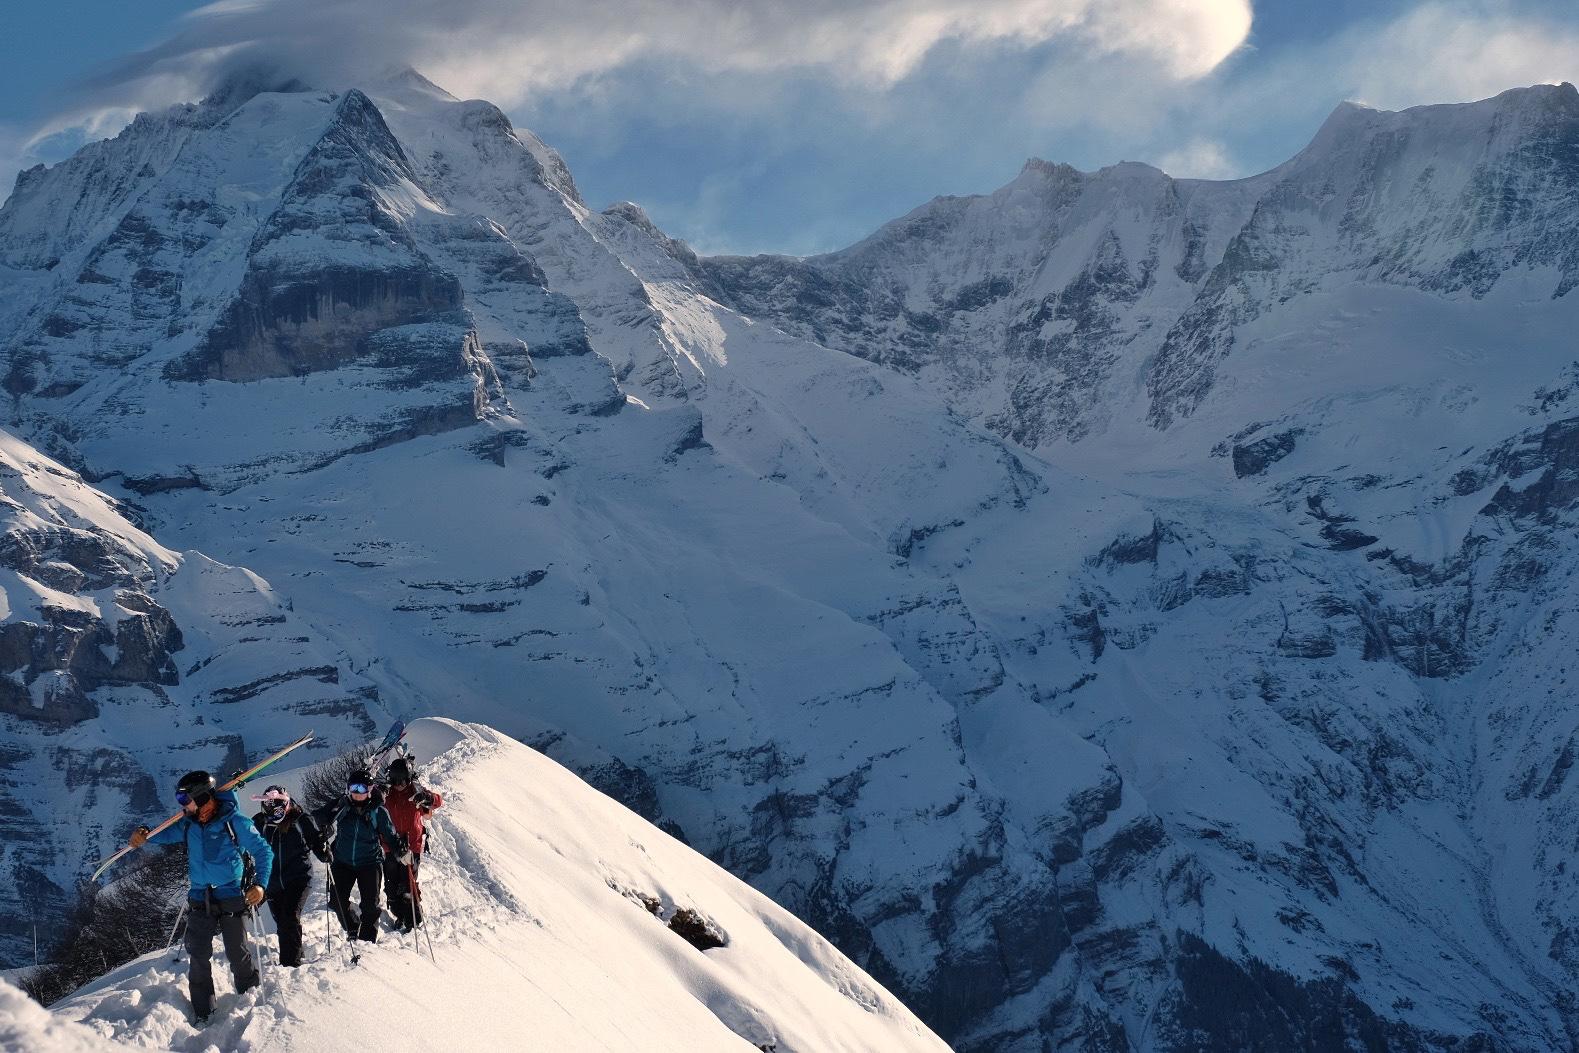 Skiers climbing a ridge above Murren, Switzerland